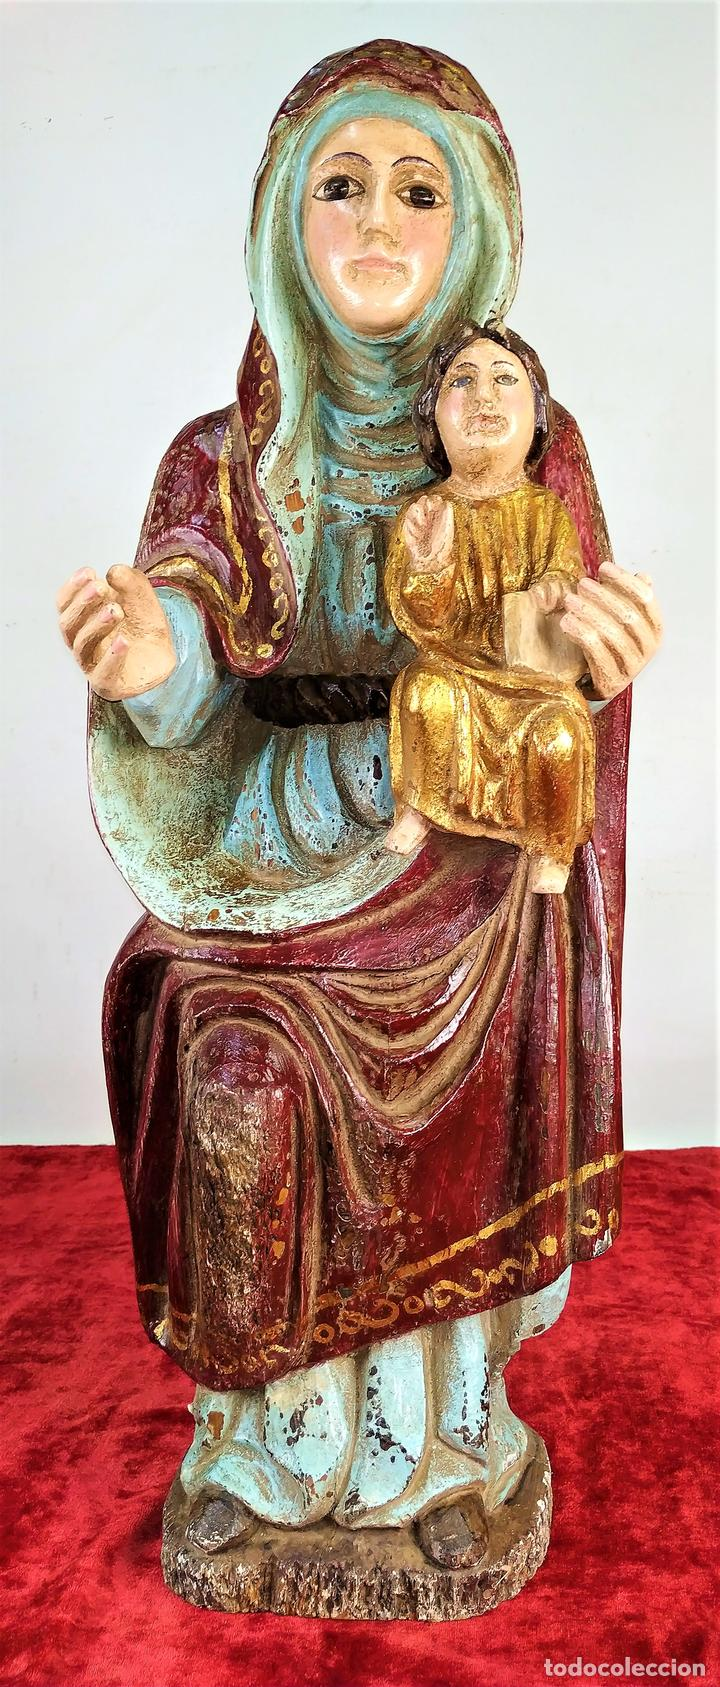 VIRGEN MARIA CON EL NIÑO. MADERA TALLADA Y POLICROMADA. ESTILO NEO-ROMÁNICO. ESPAÑA. XX (Arte - Arte Religioso - Escultura)